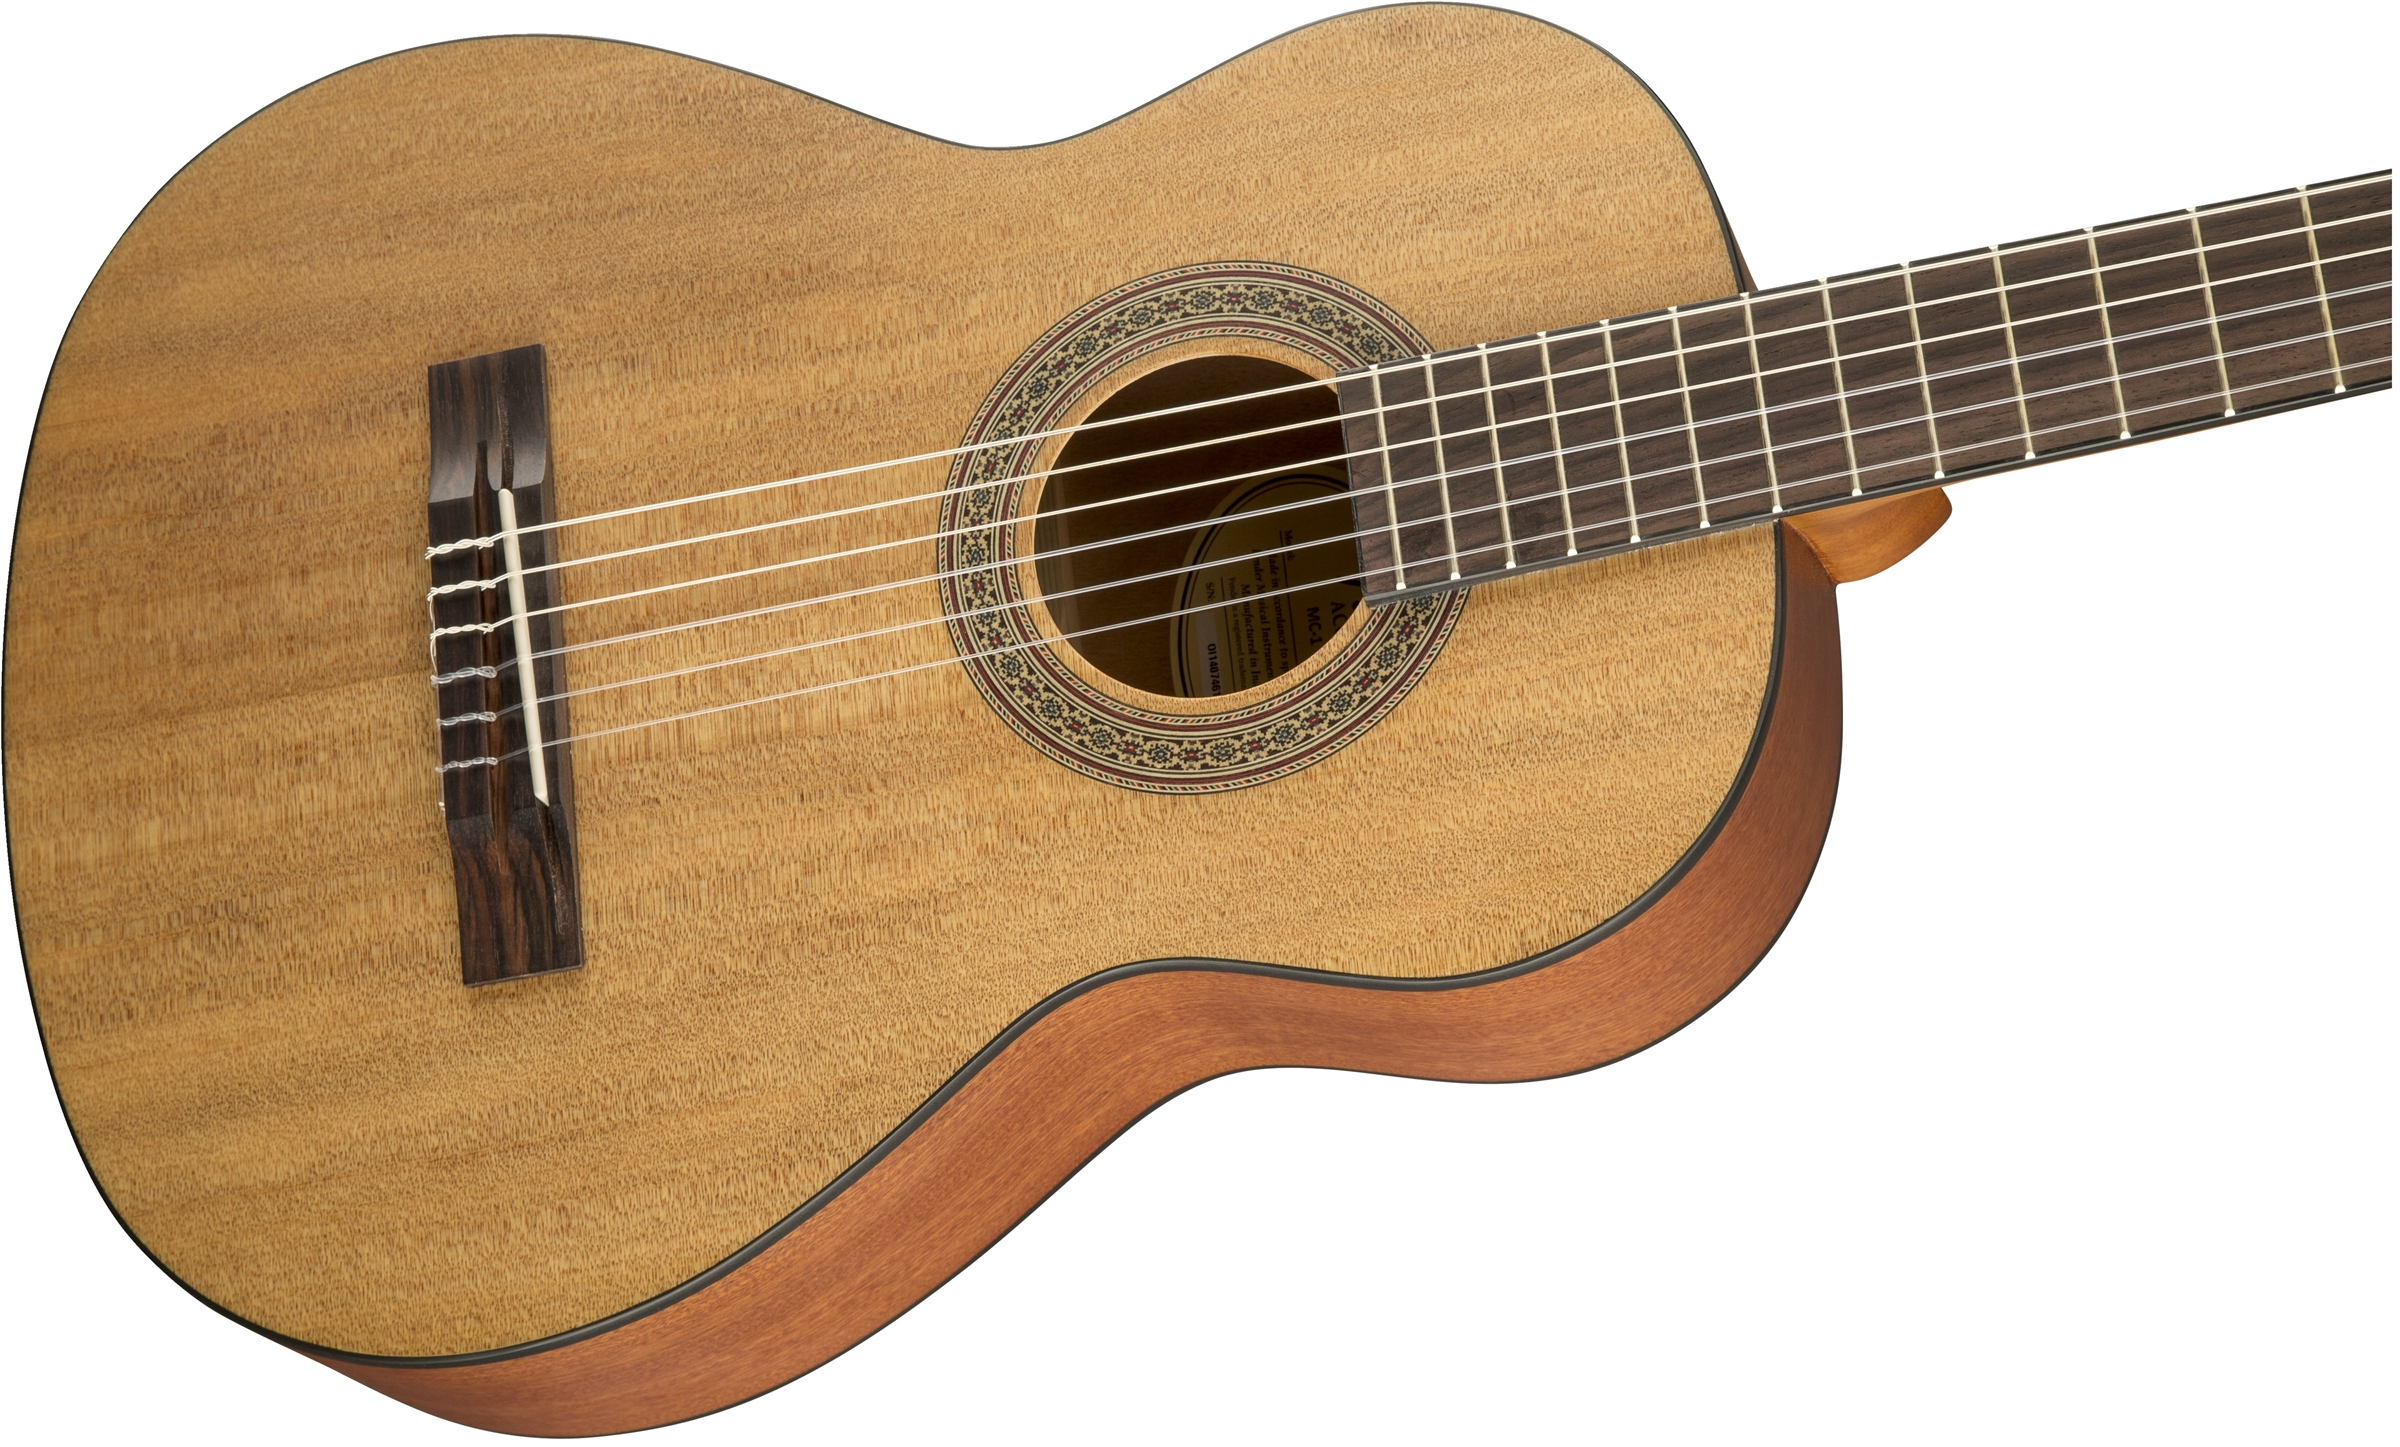 mc 1 3 4 nylon acoustic guitars. Black Bedroom Furniture Sets. Home Design Ideas